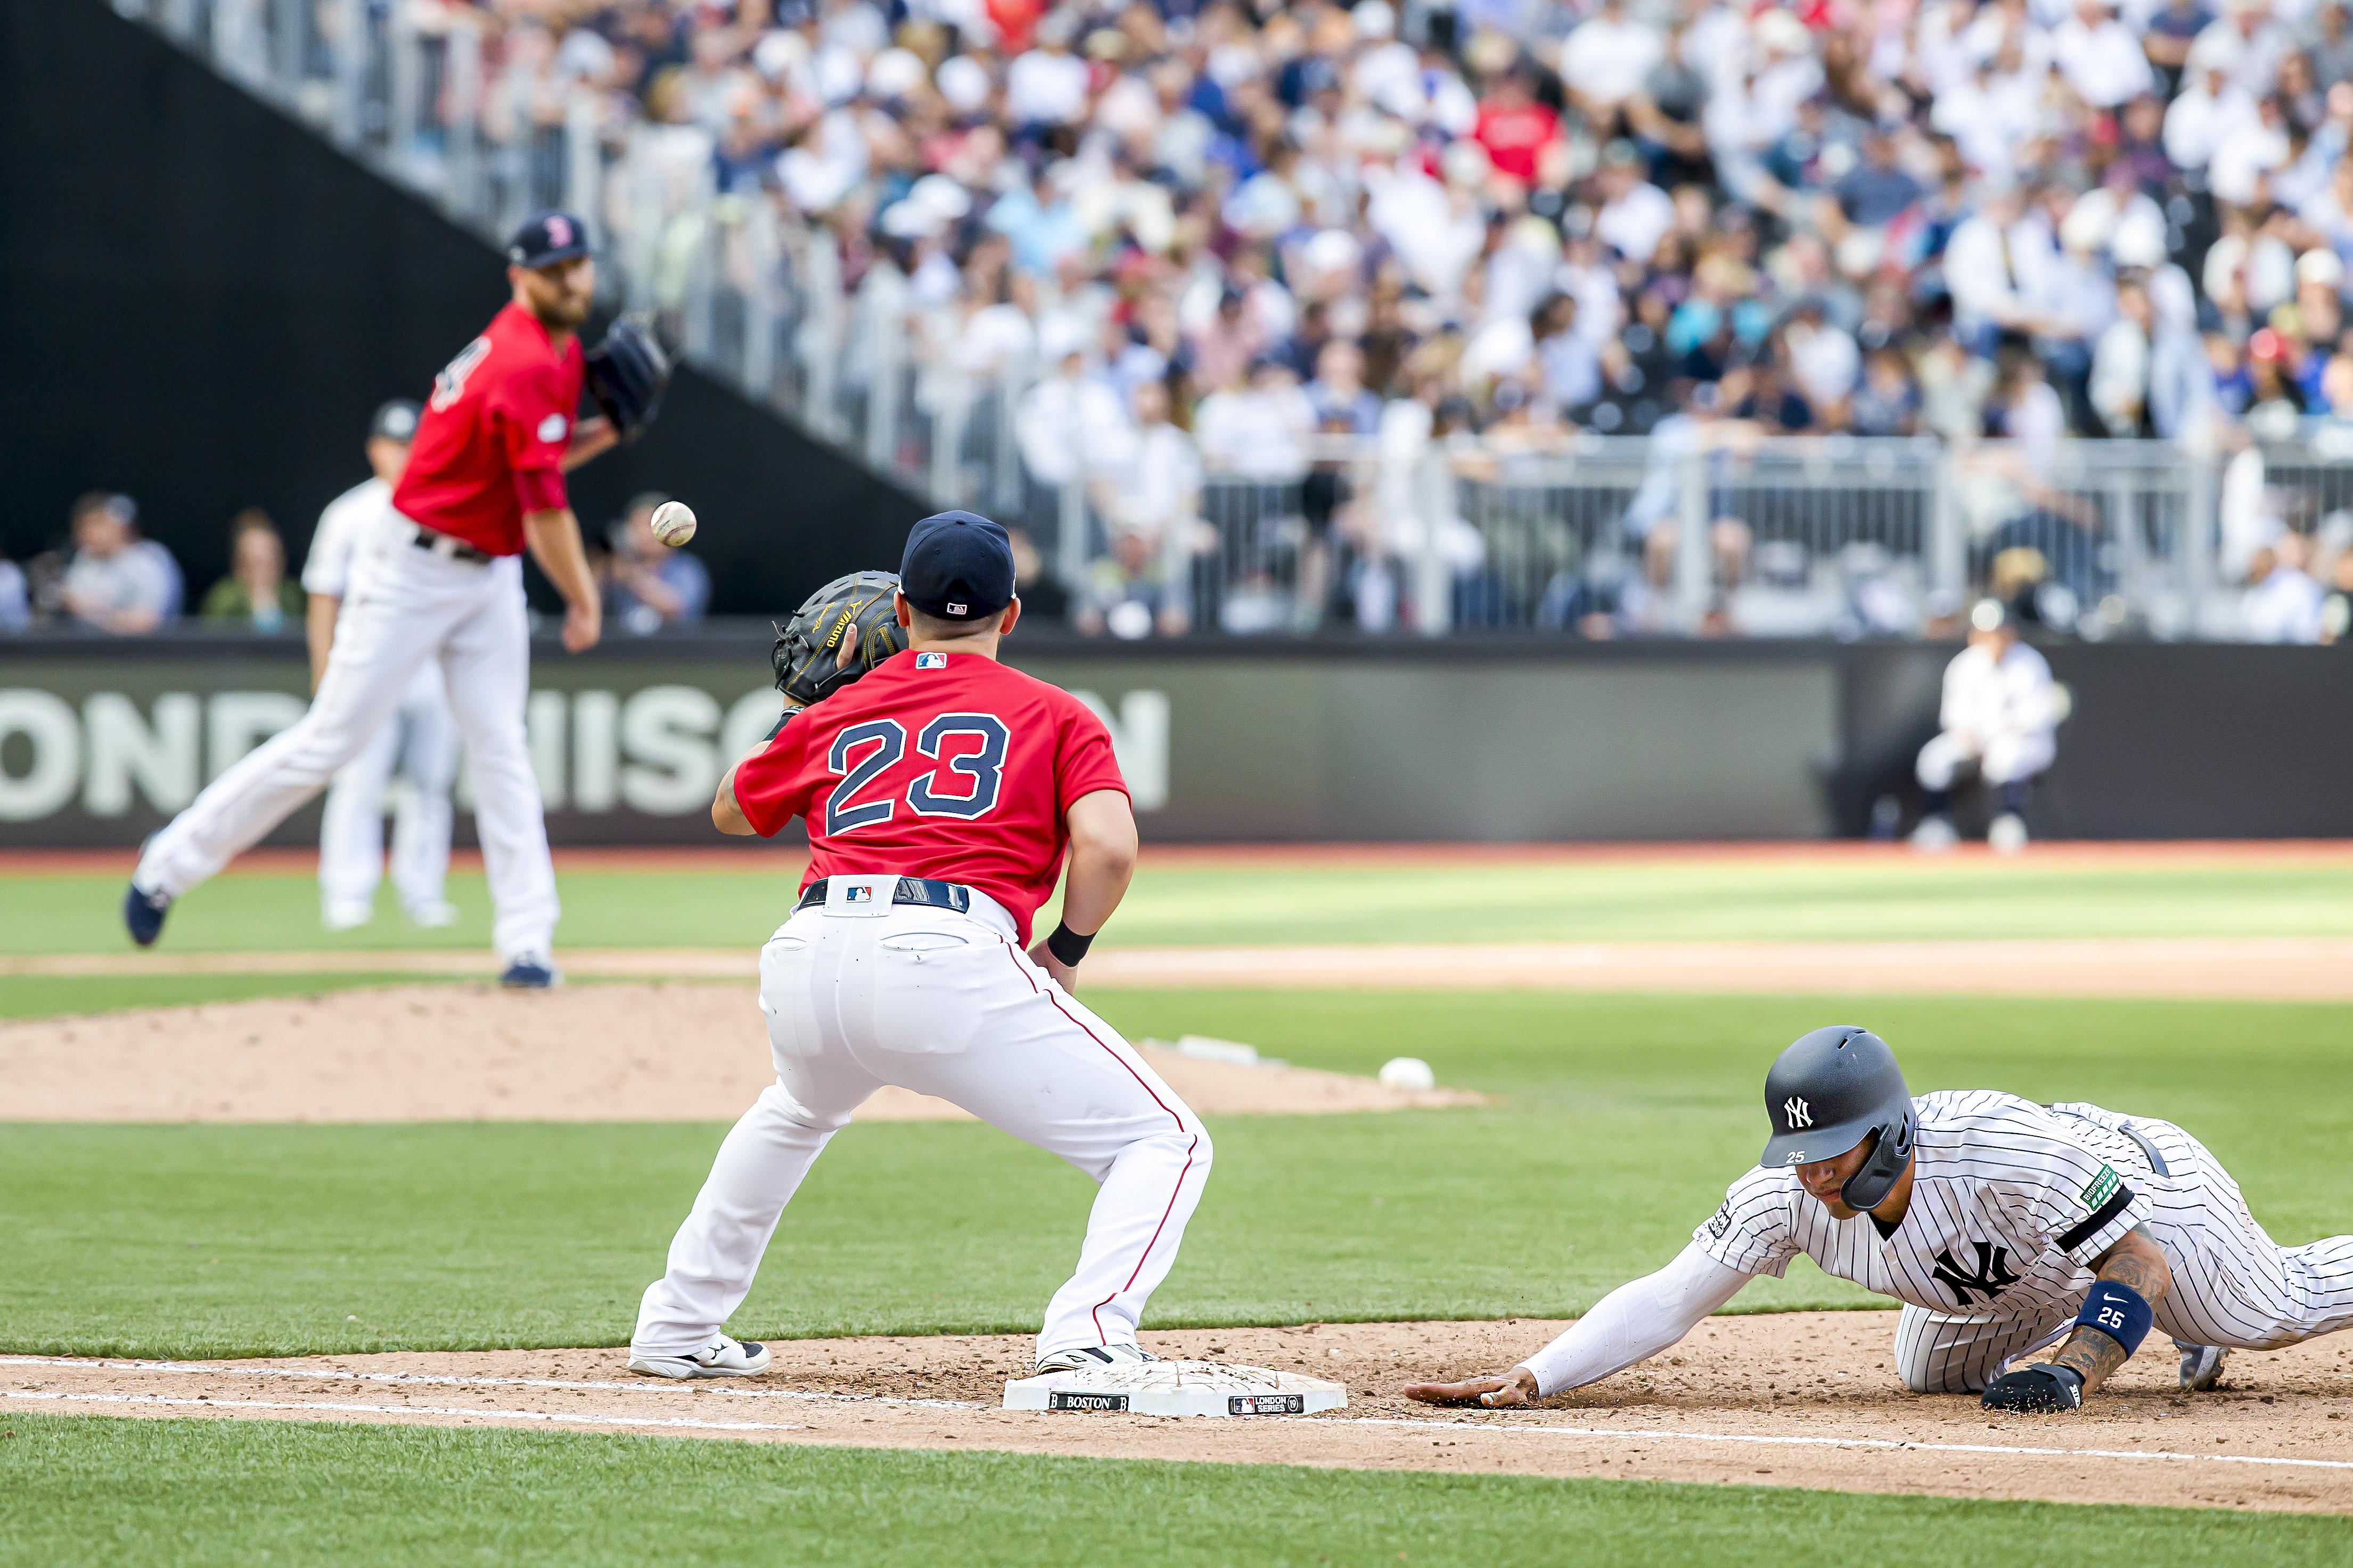 2019_06_30_Baseball_057 edited